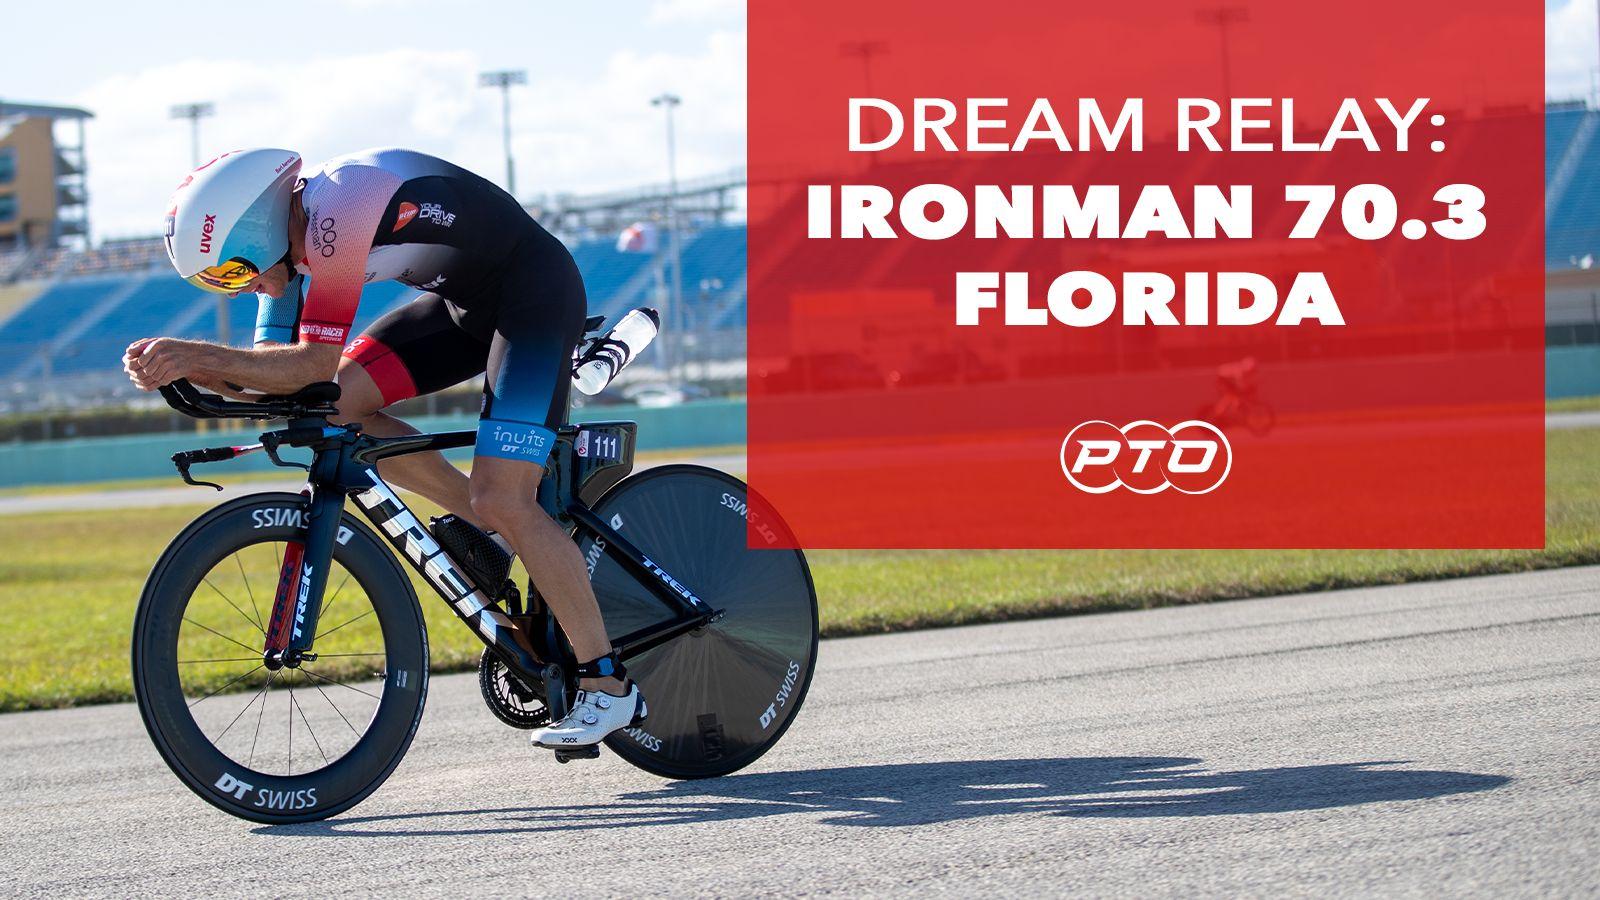 Dream Relay: IRONMAN 70.3 Florida